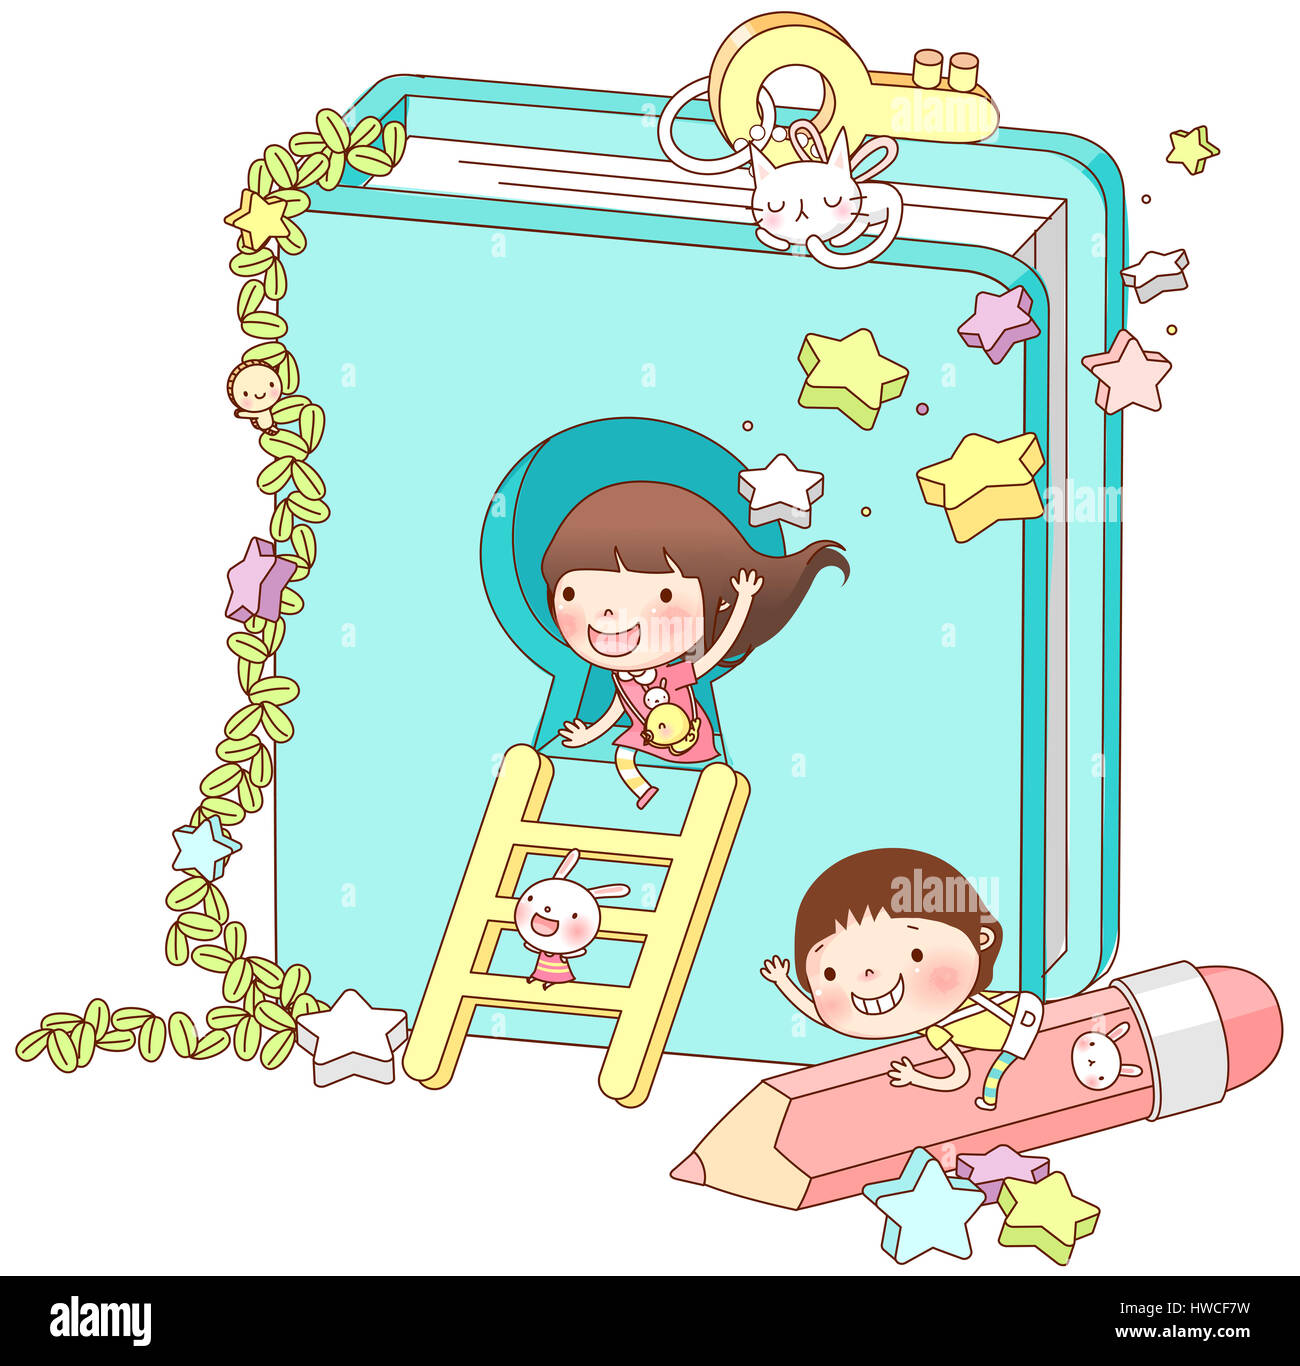 animal representation,art,book,childhood,color image,colored